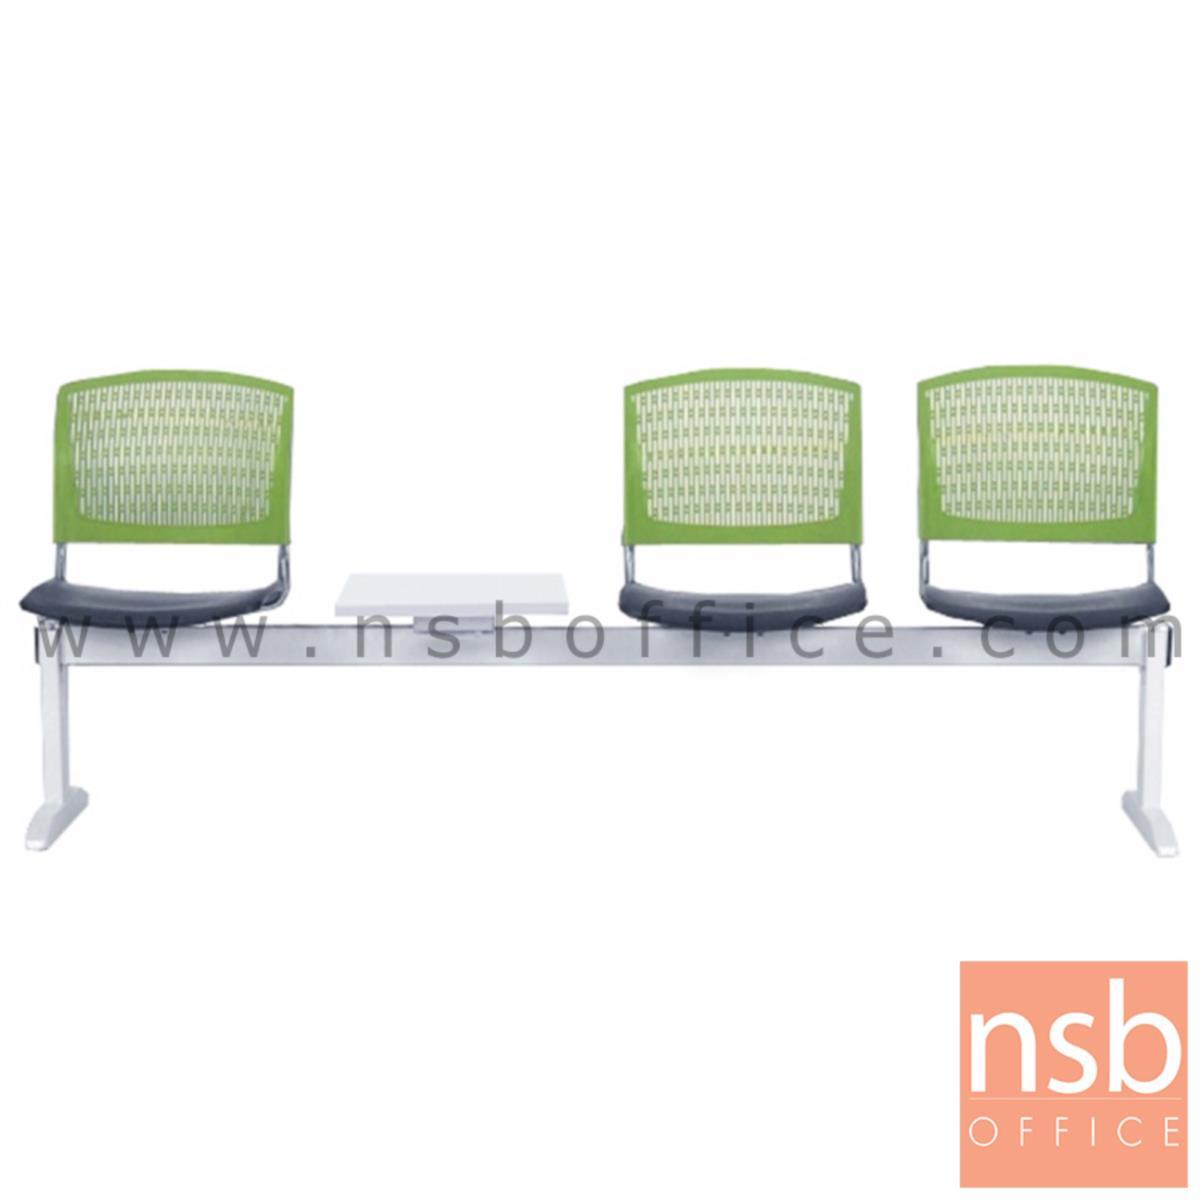 B06A127:เก้าอี้นั่งคอยเฟรมโพลี่ รุ่น MOFO 2 ,3 ที่นั่ง ขนาด 160.5W ,175W cm. พร้อมที่วางของ ขาเหล็ก